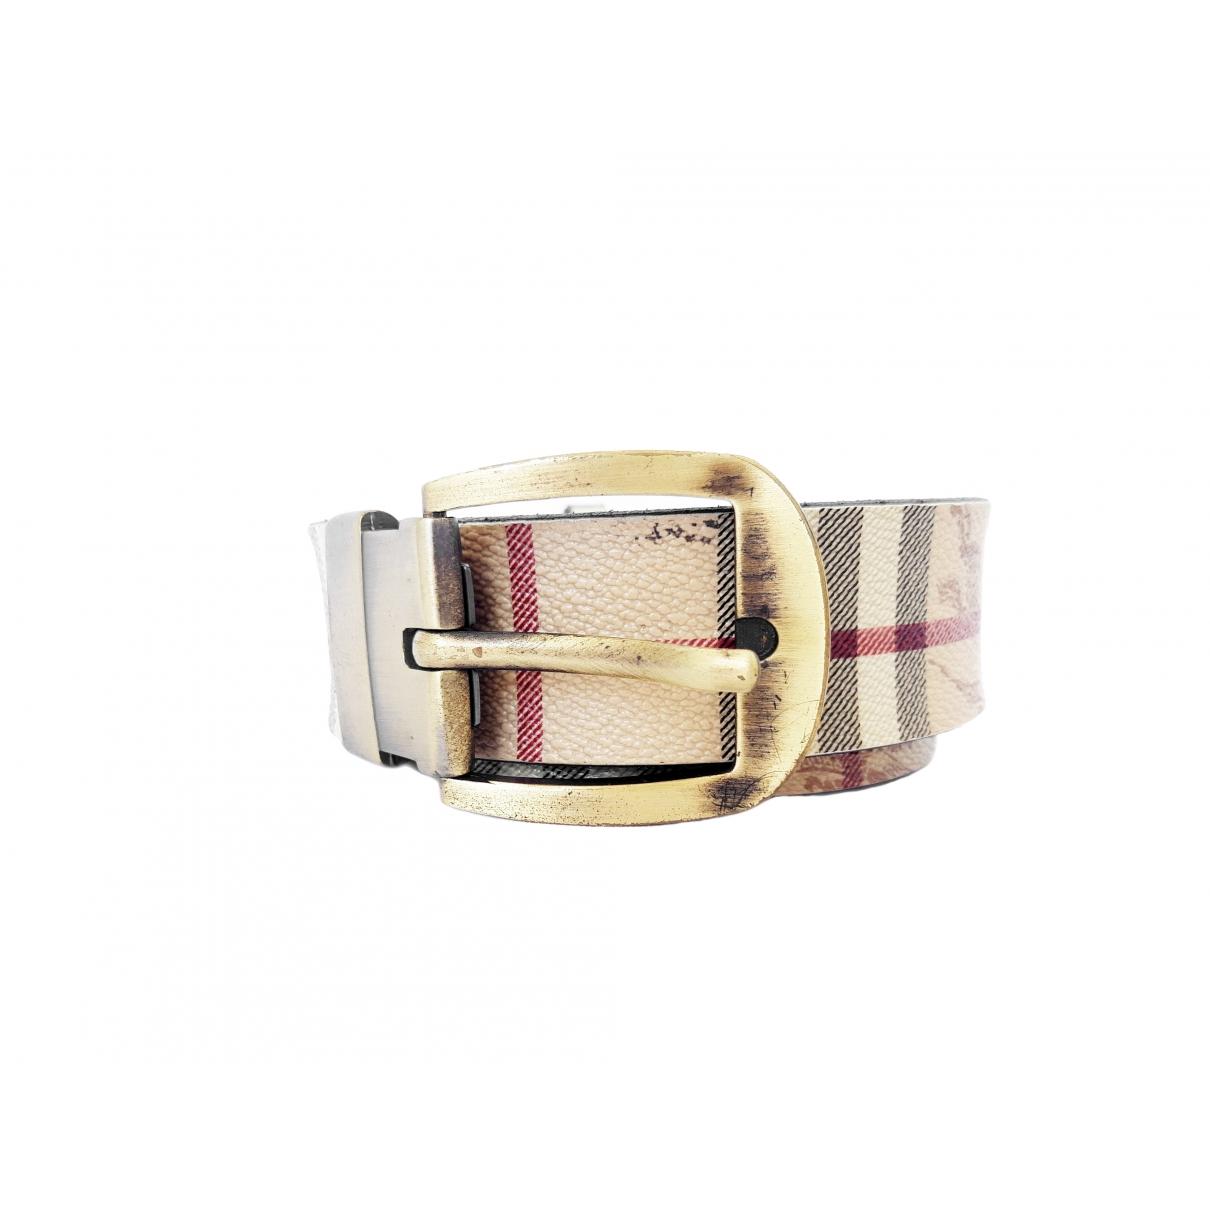 Burberry \N Cloth belt for Men 100 cm